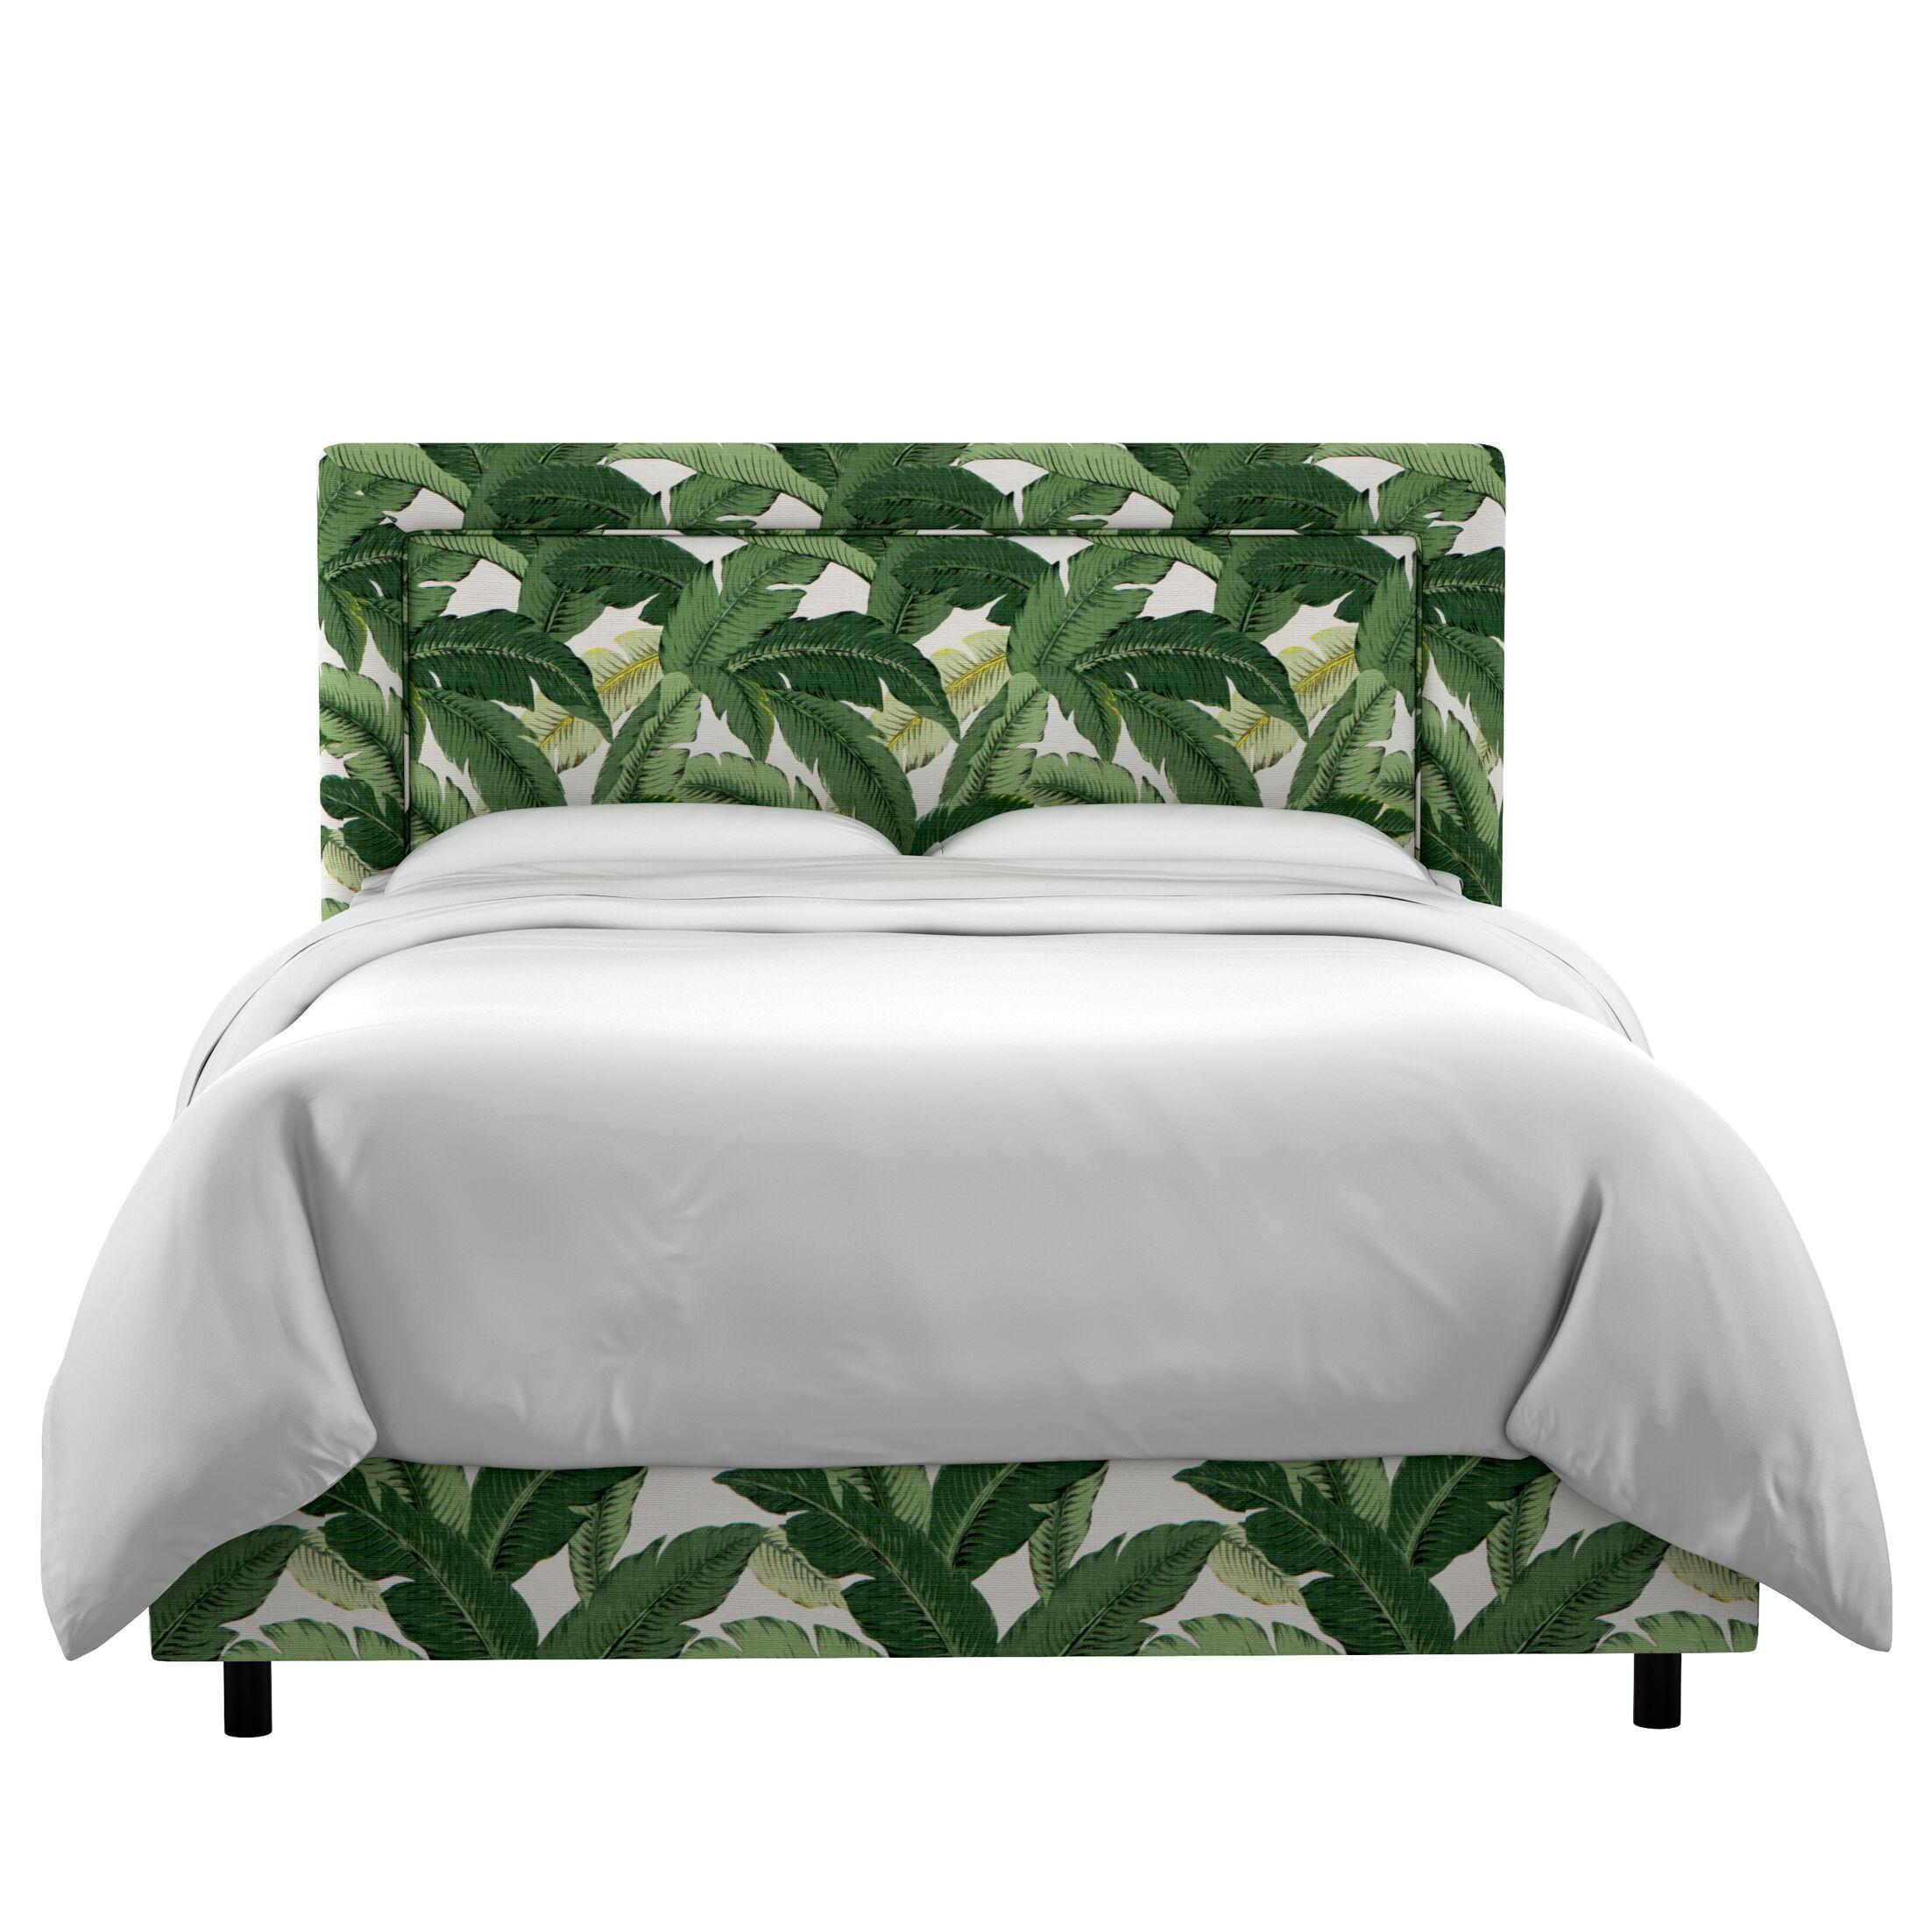 Promfret Swaying Palm Aloe Border Linen Upholstered Panel Bed Size: Queen